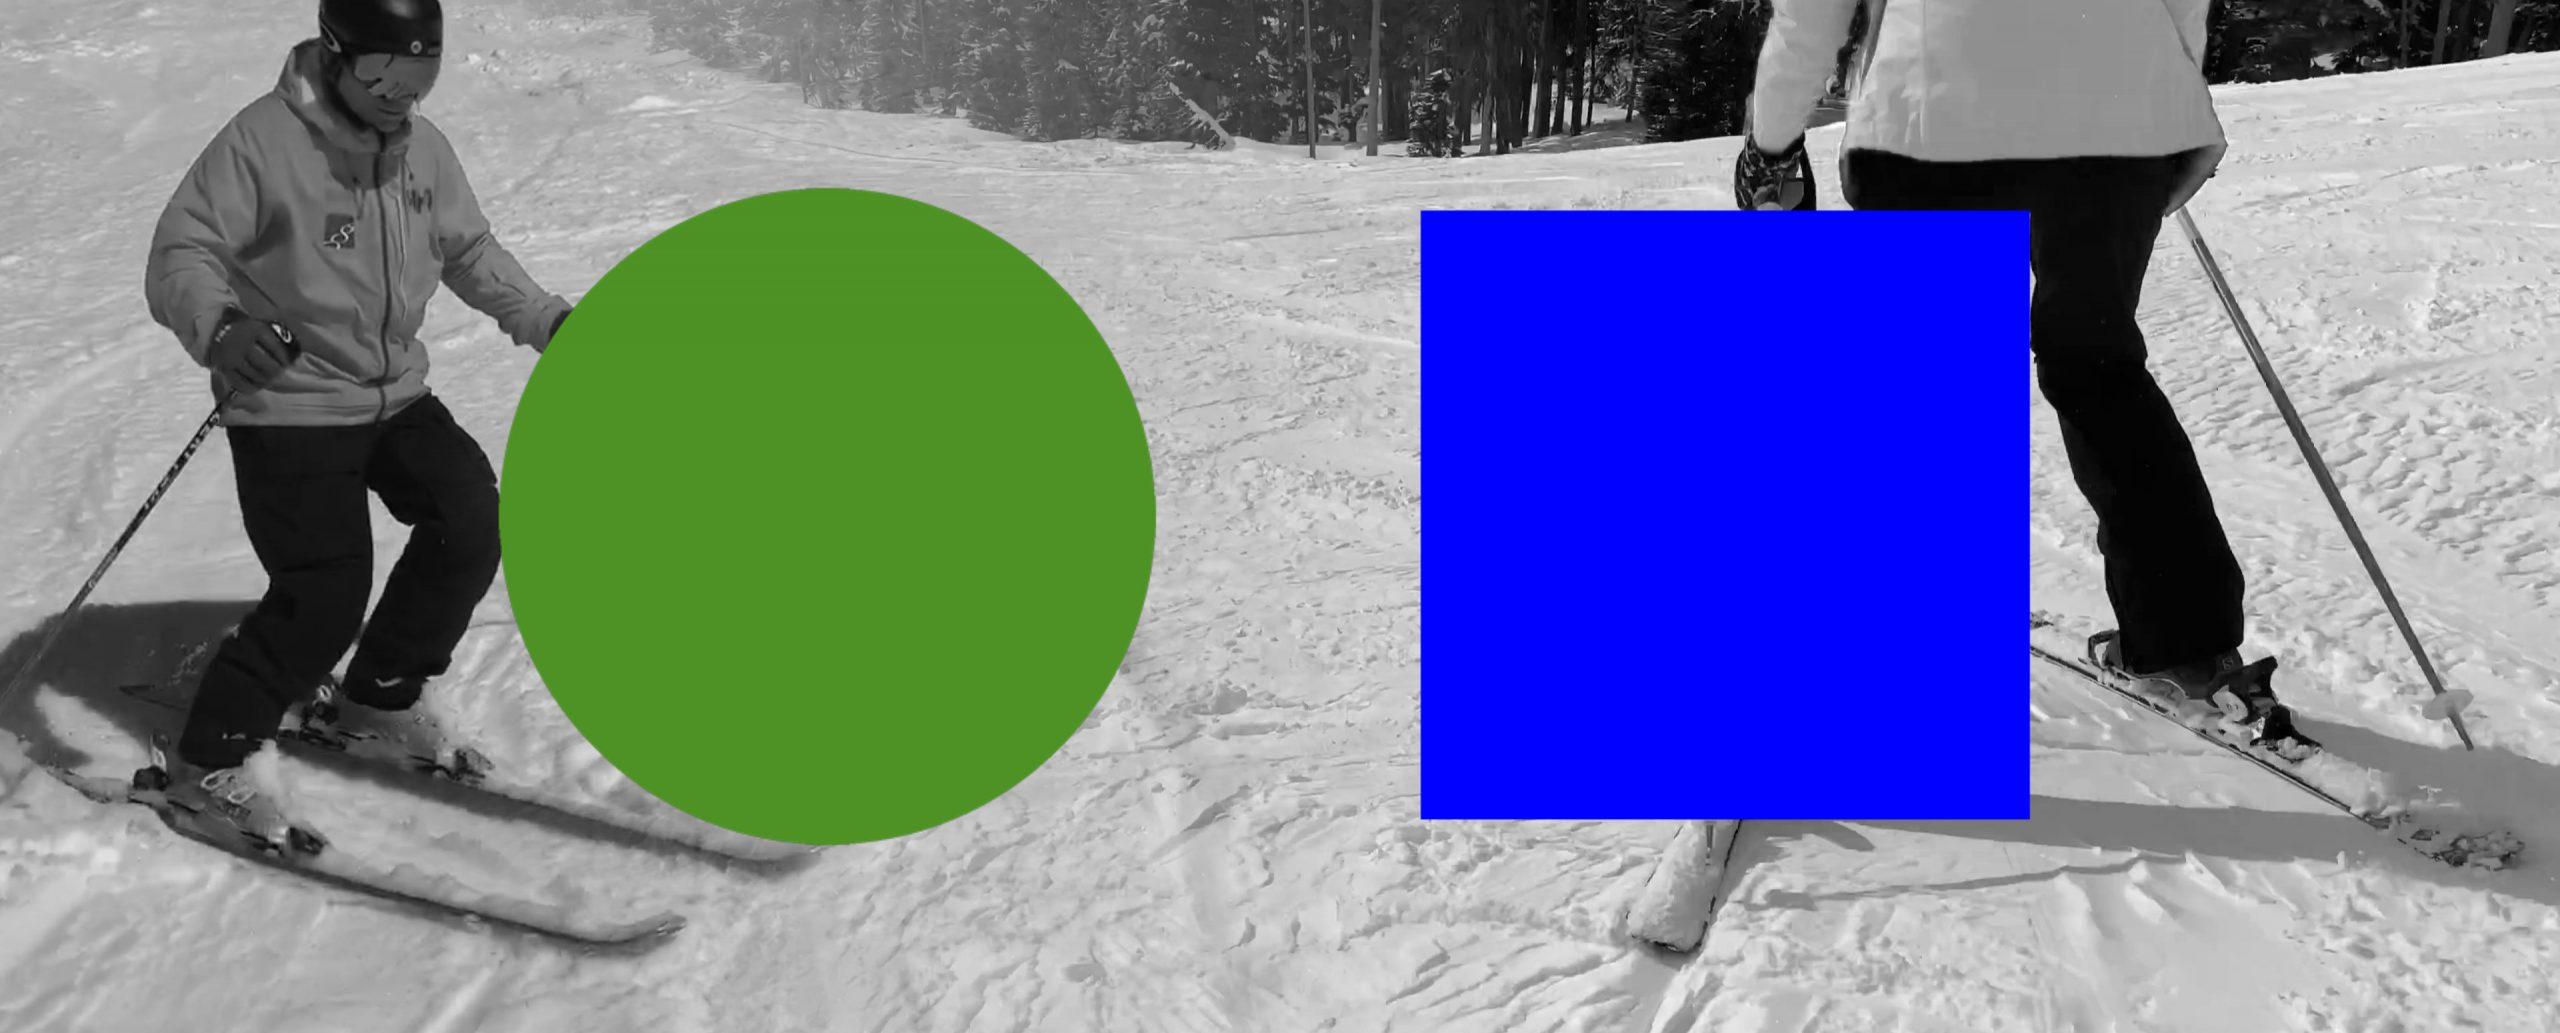 Novice Progression - Wedge To Parallel